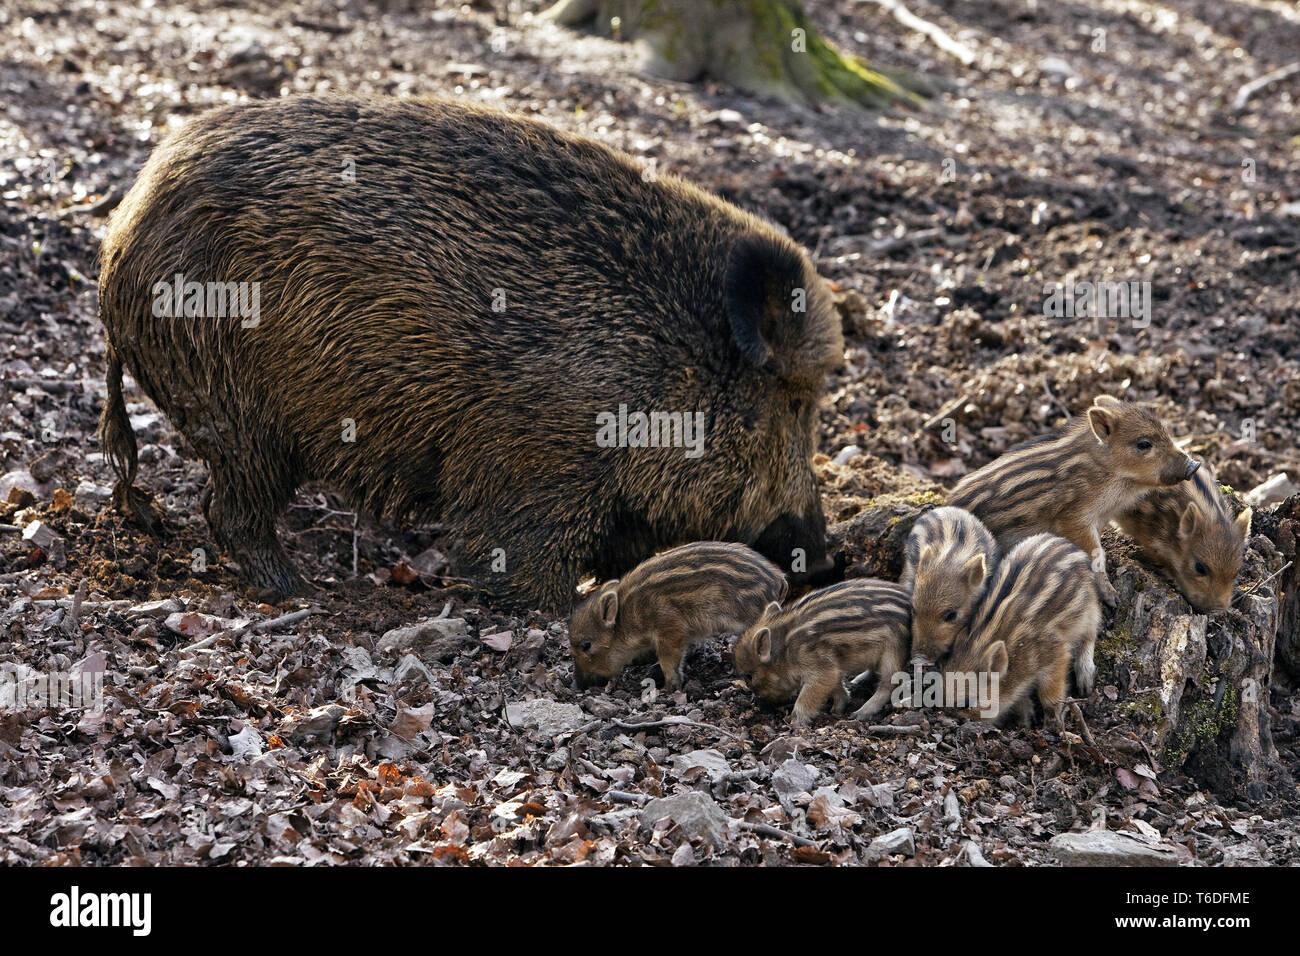 wild Boar, Sus scrofa, Nationalpark Bavarian forest, Germany - Stock Image